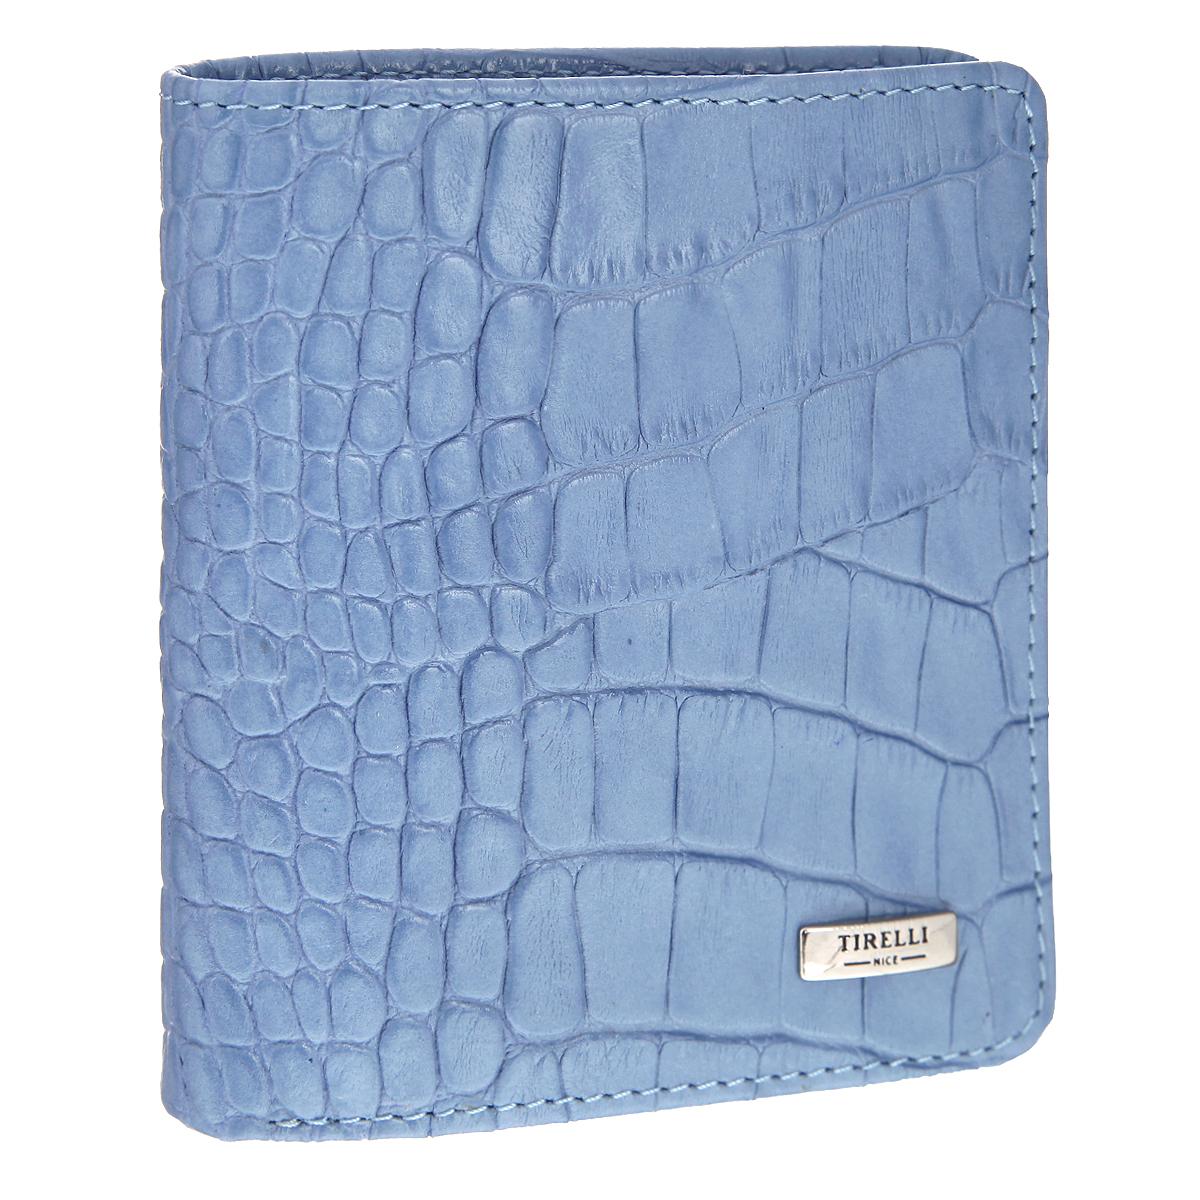 "Портмоне ""Tirelli"", цвет: голубой. 15-311-21 ( 15-311-21 )"